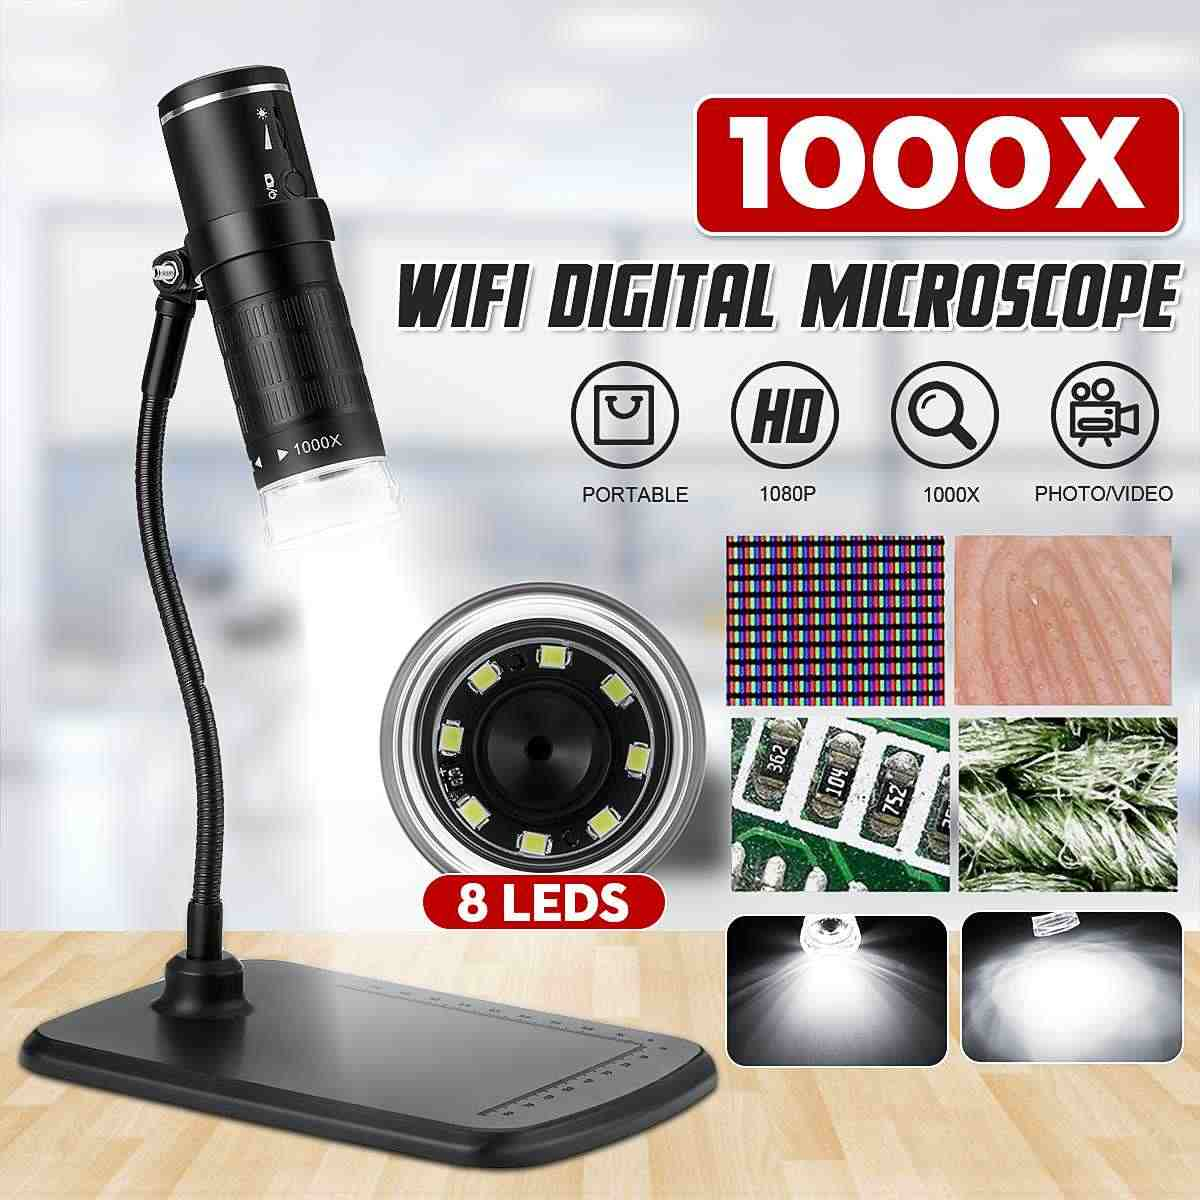 1000 x 1920 x 1080p Microscopio digital WiFi microscopio WiFi microscopio digital WiFi ajustable 8 luces LED